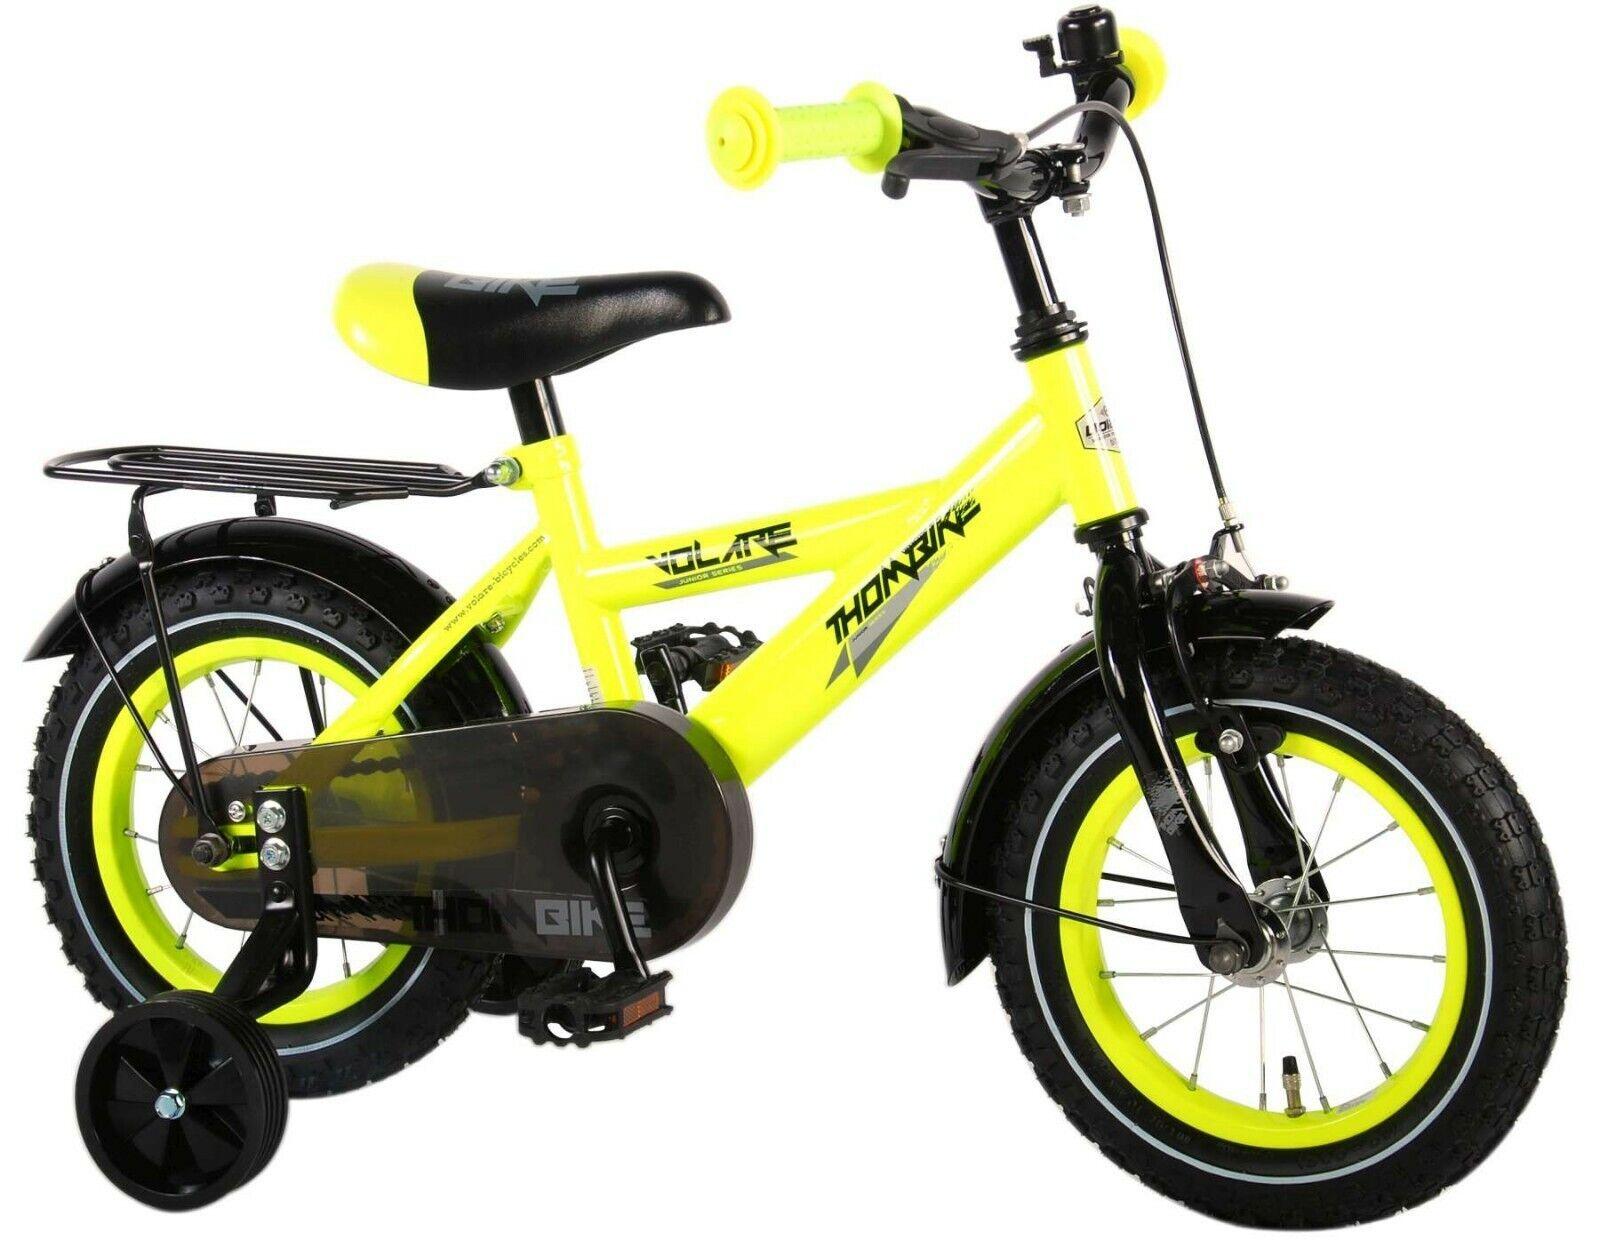 Jungenfahrrad 12 14 14 14 16   Zoll Kinderfahrrad Fahrrad Gelb Schwarz Grün Blau c7b606